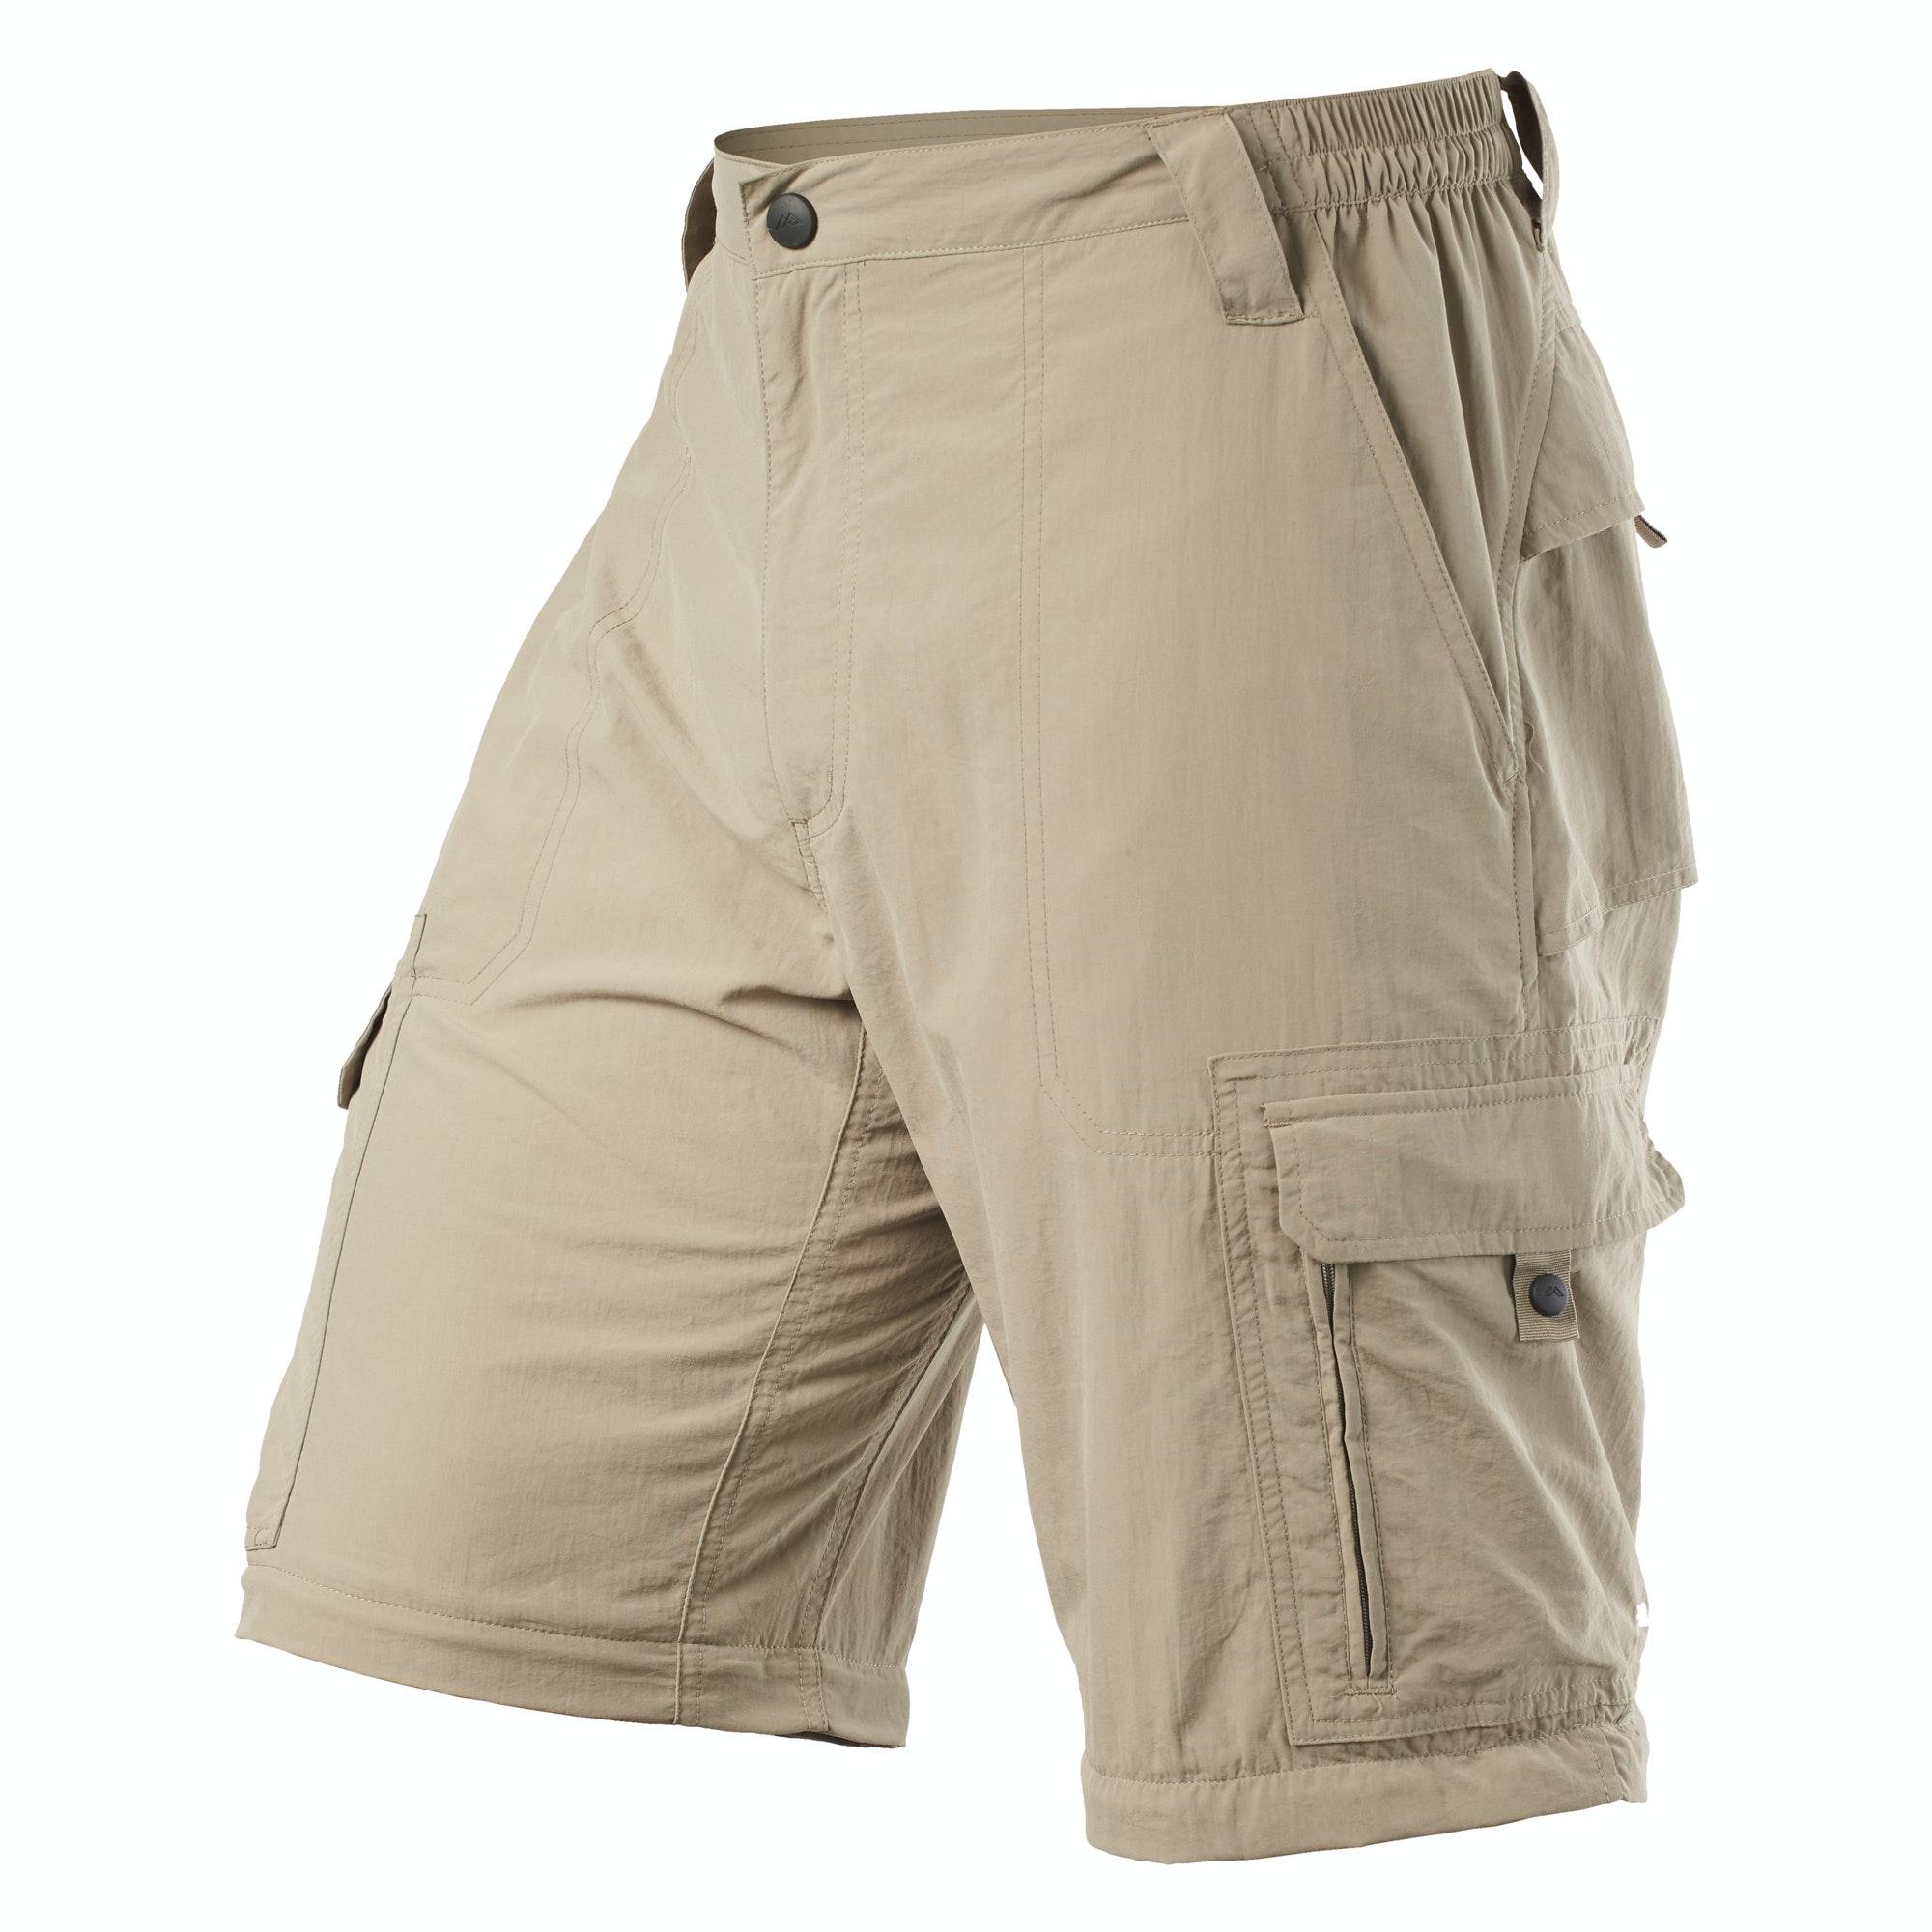 NEW-Kathmandu-Barga-Men-039-s-Travel-Zip-Off-Convertible-Cargo-Trousers-Shorts